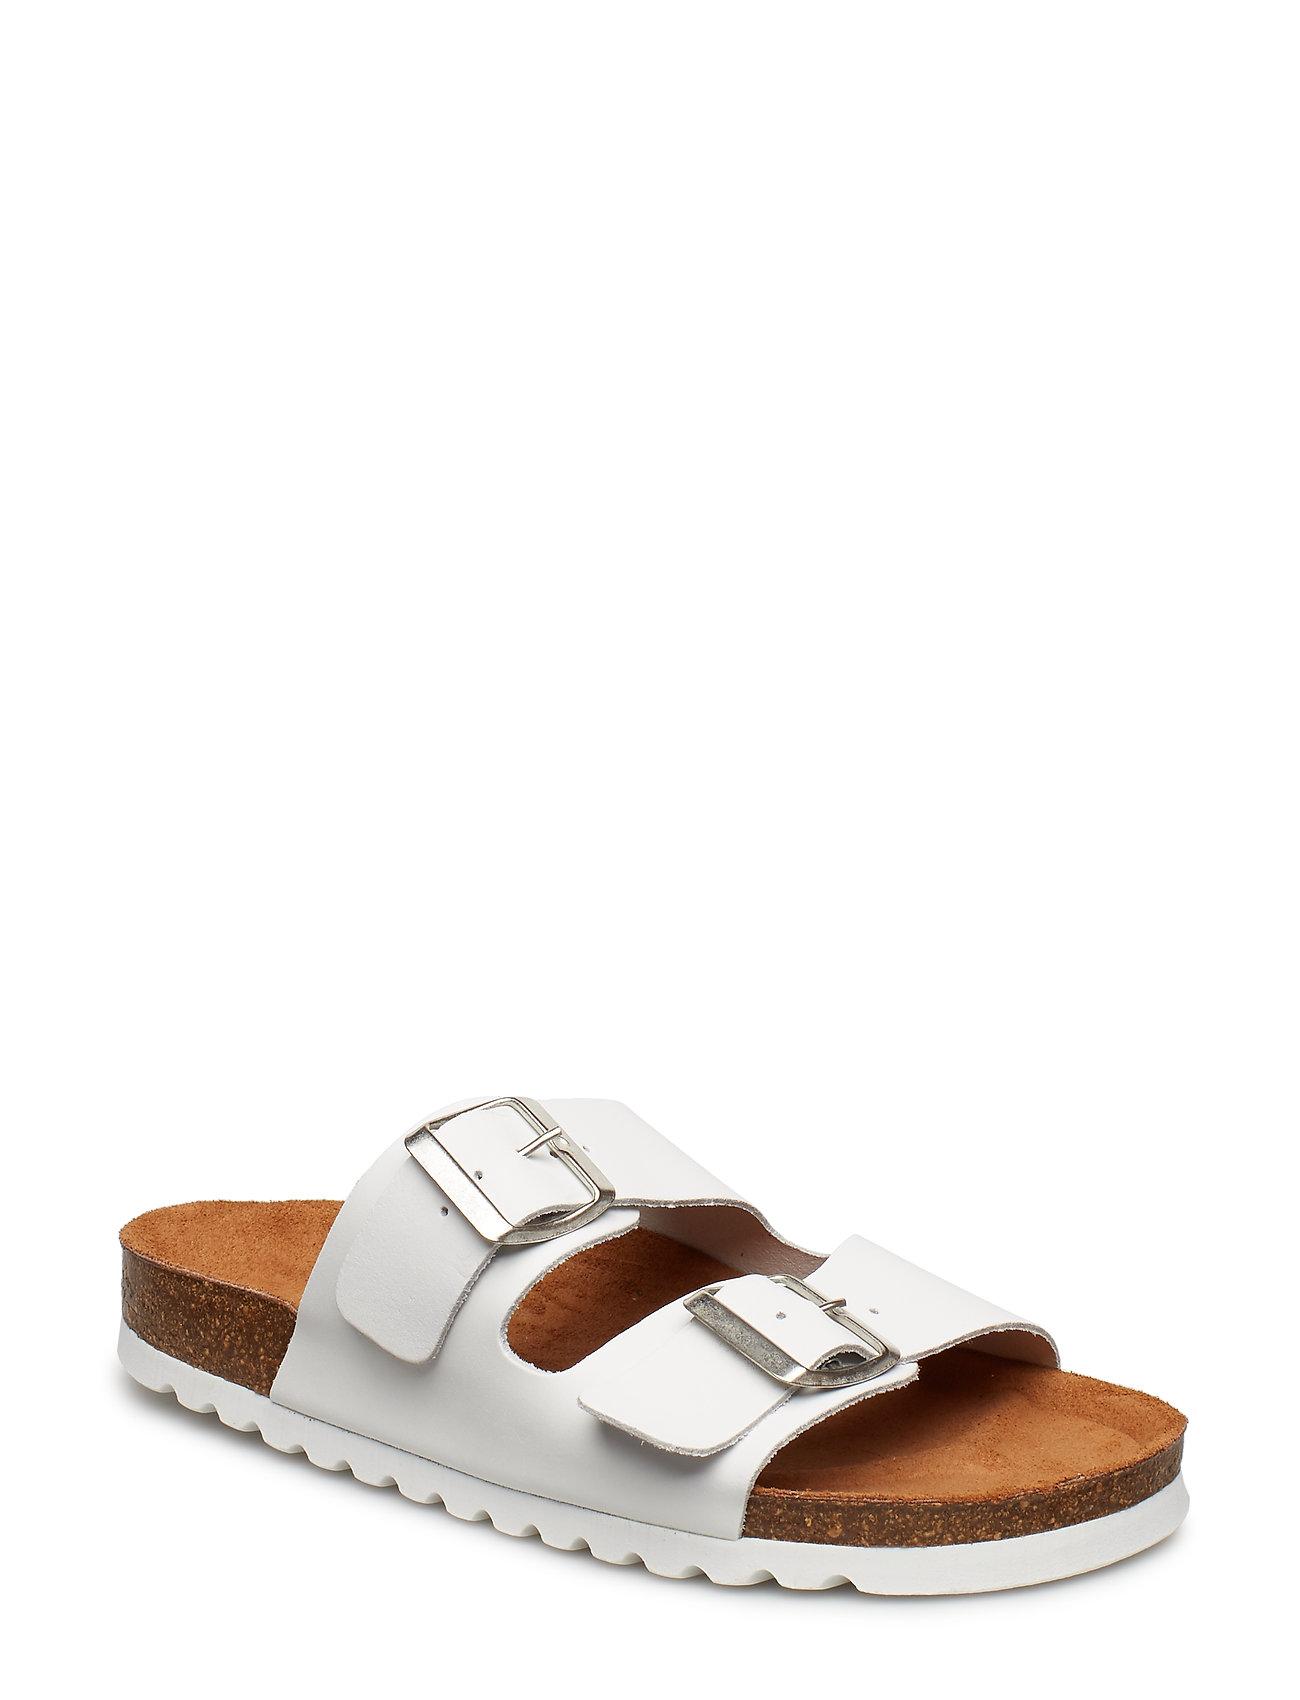 f915e4a01 Vmnicoline Leather Sandal Flade Sandaler Hvid VERO MODA